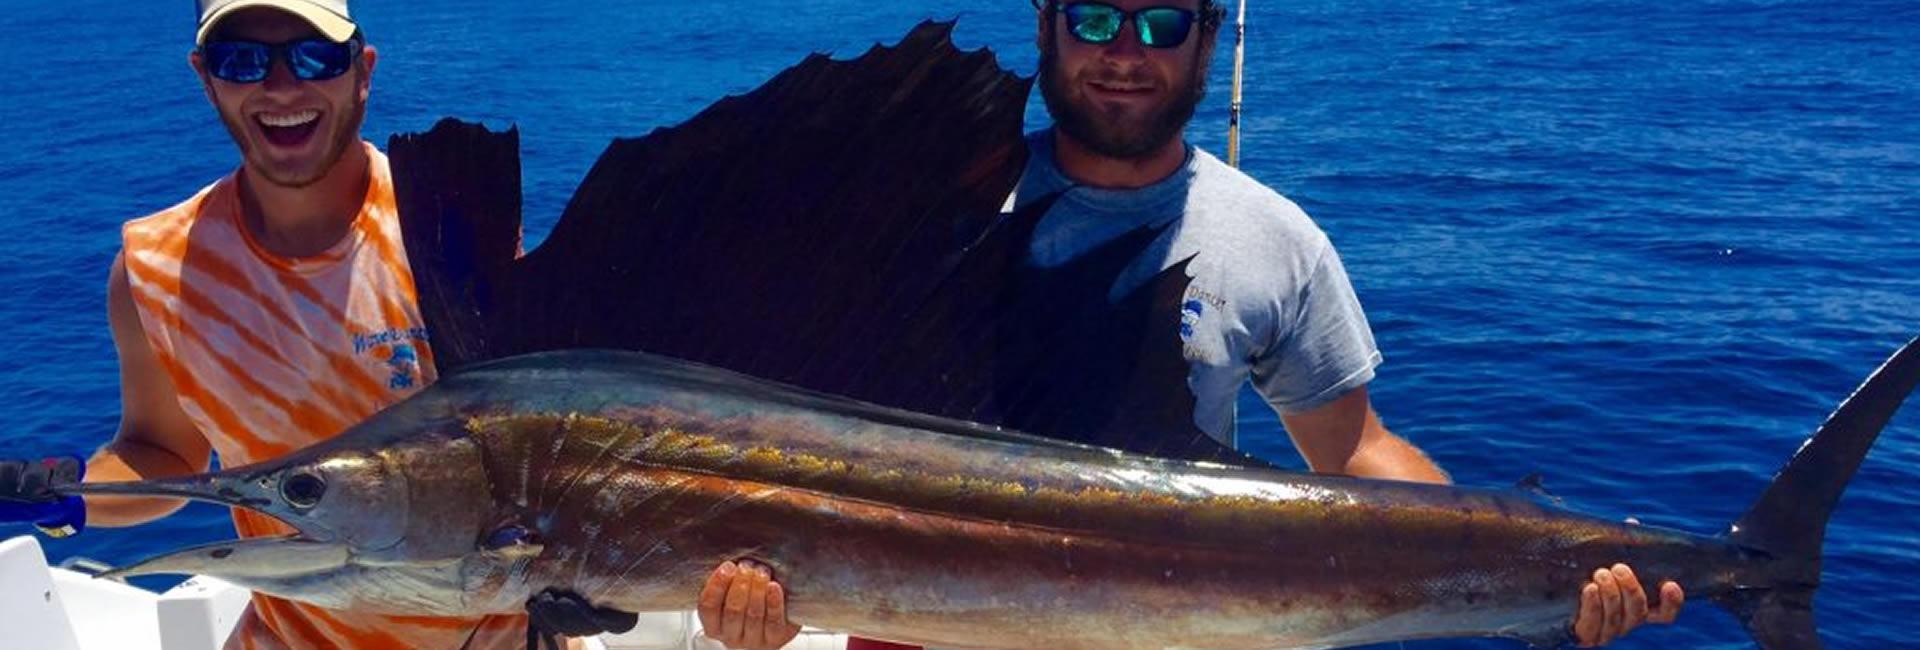 Wave Dancer Fishing Charters Galveston Tx